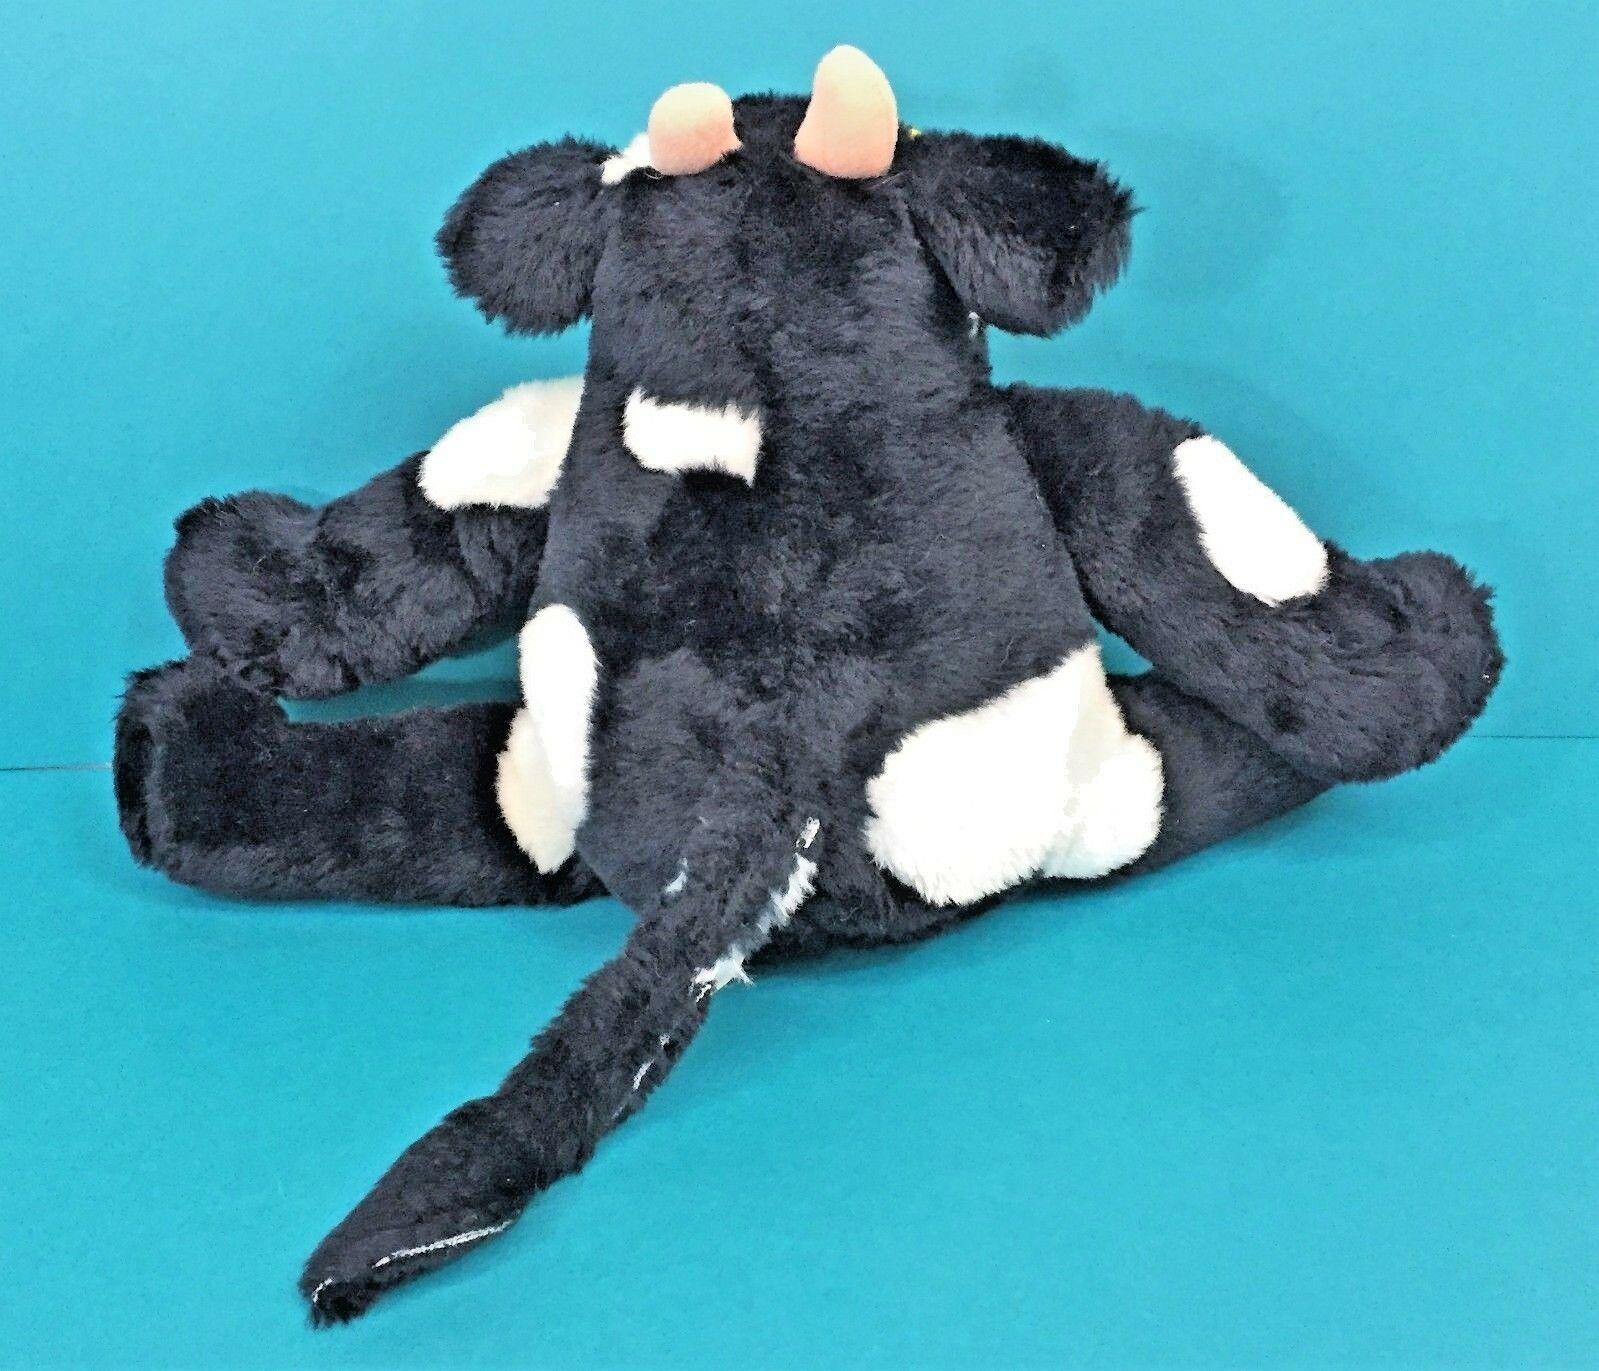 Commonwealth Cow Moos Black White Plush Sunglasses Stuffed Animal Vintage 1987